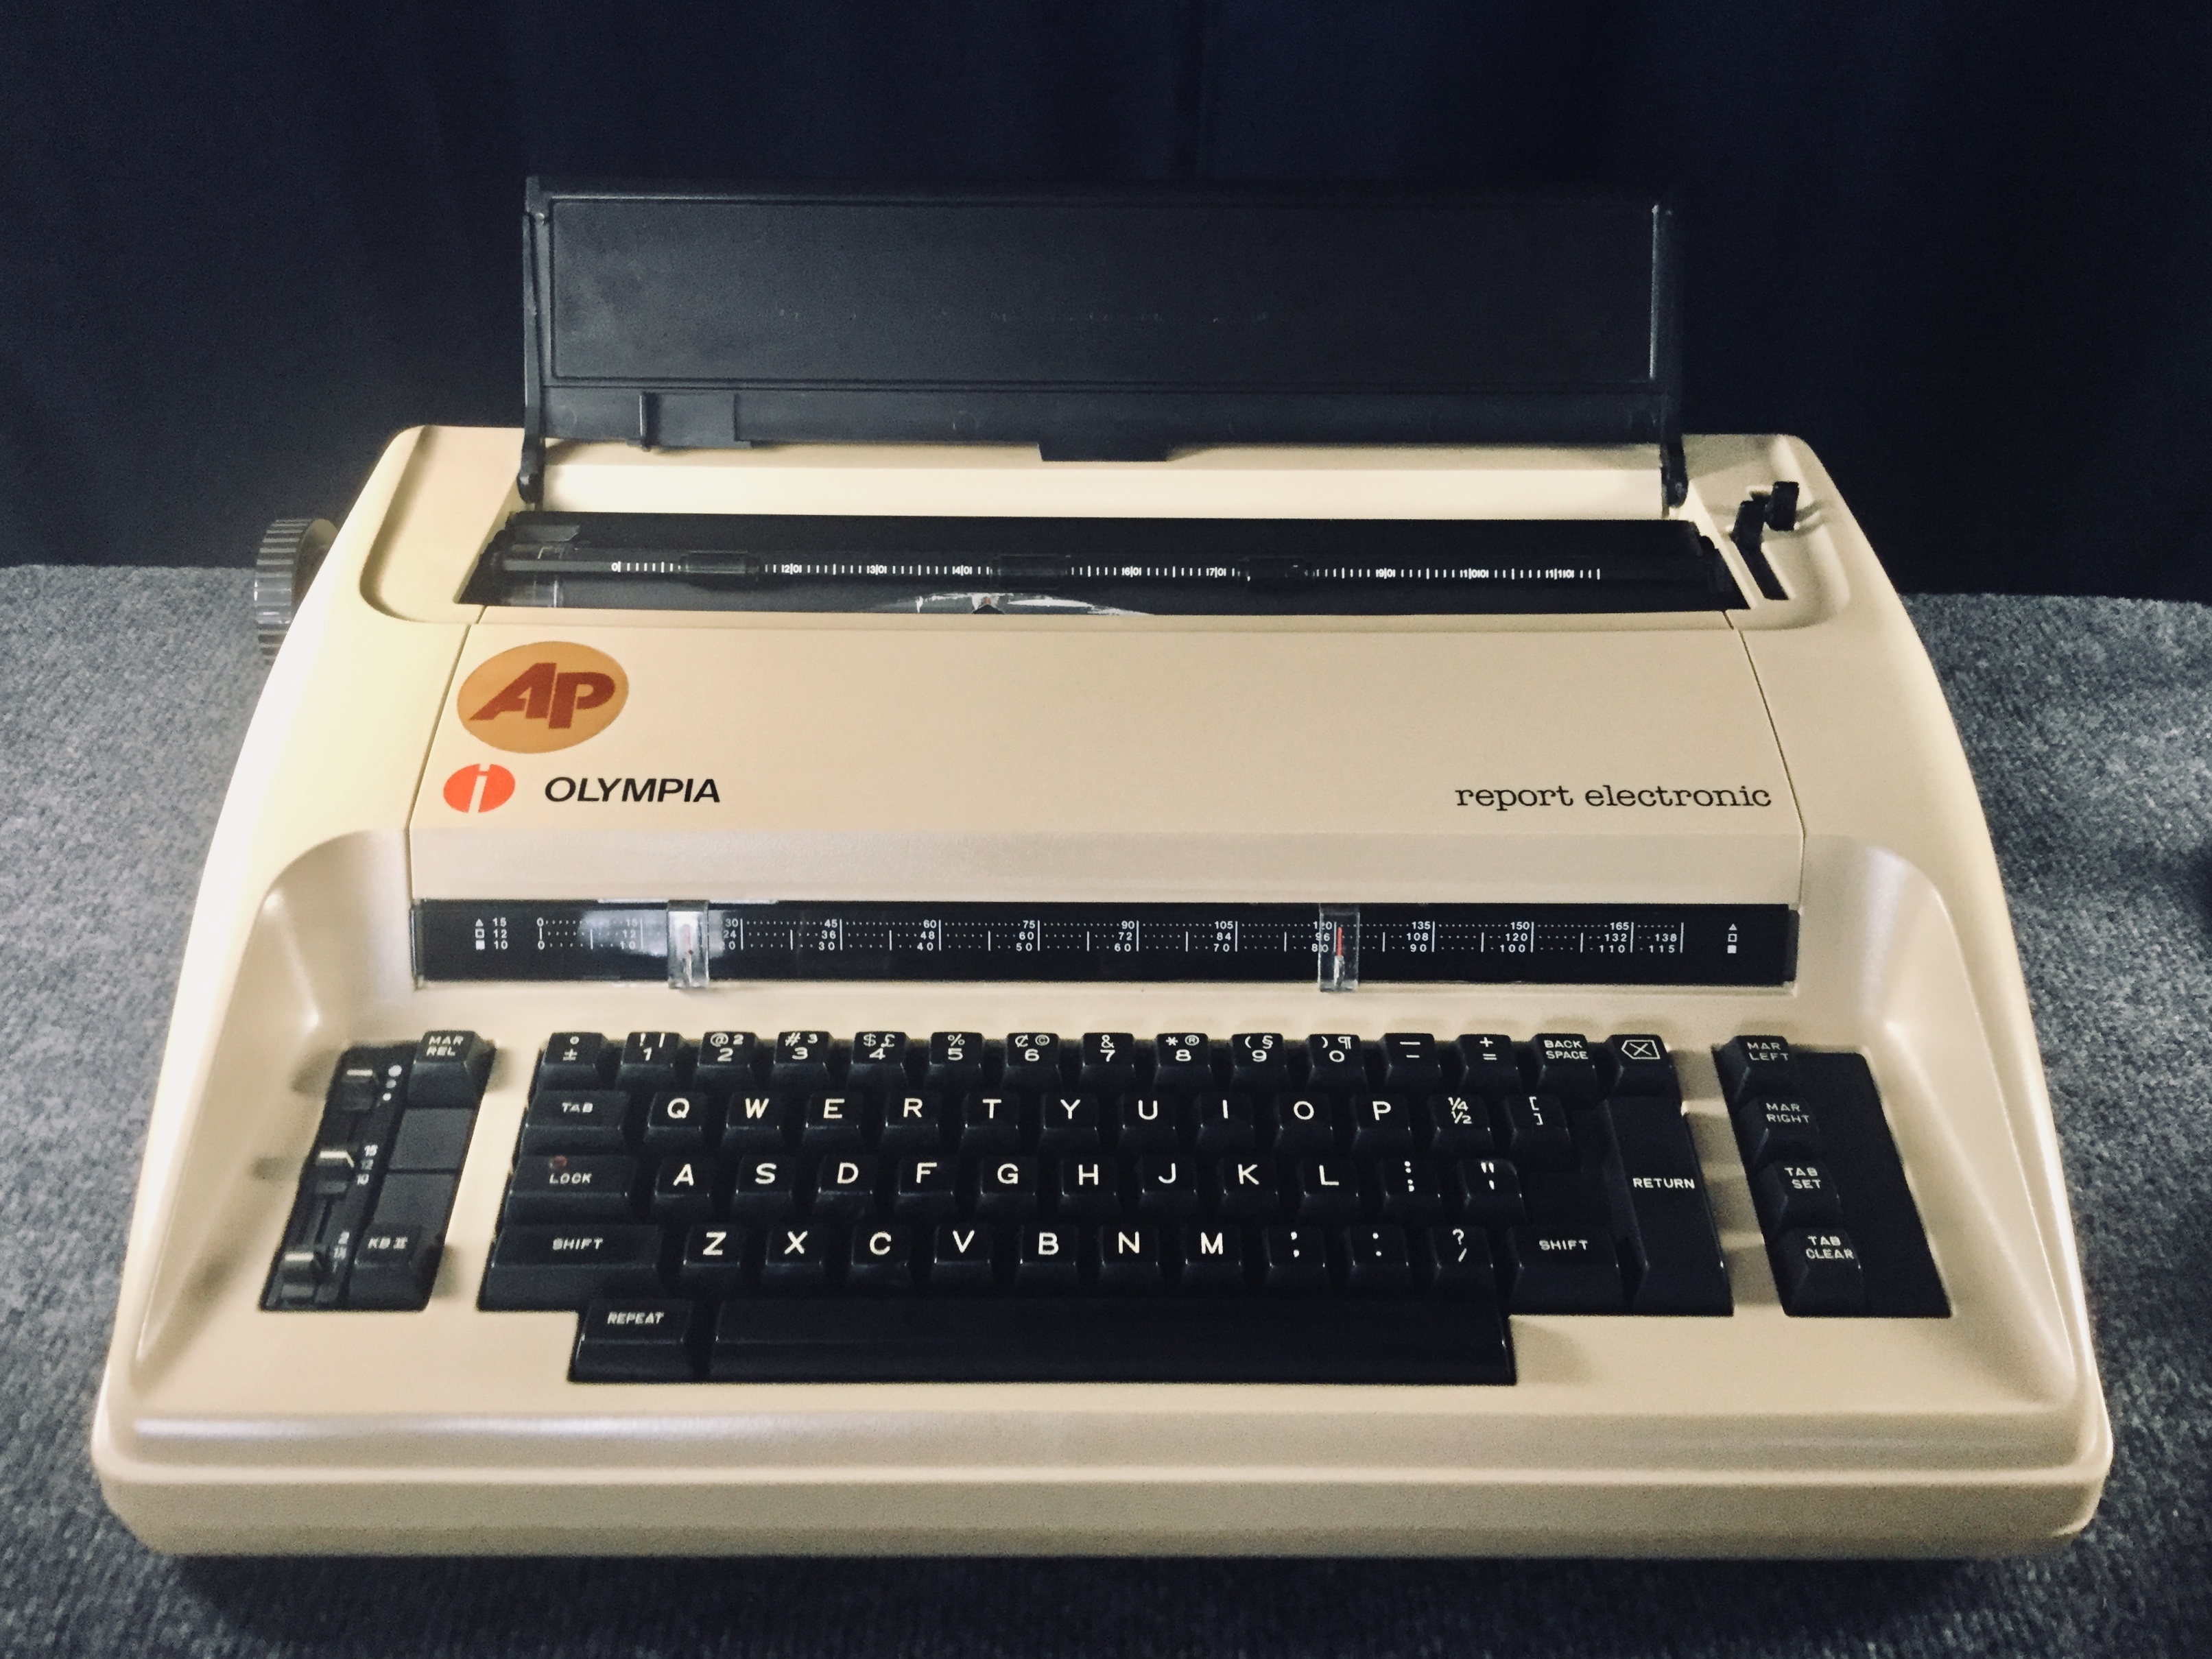 Olympia report electronic Typewriter